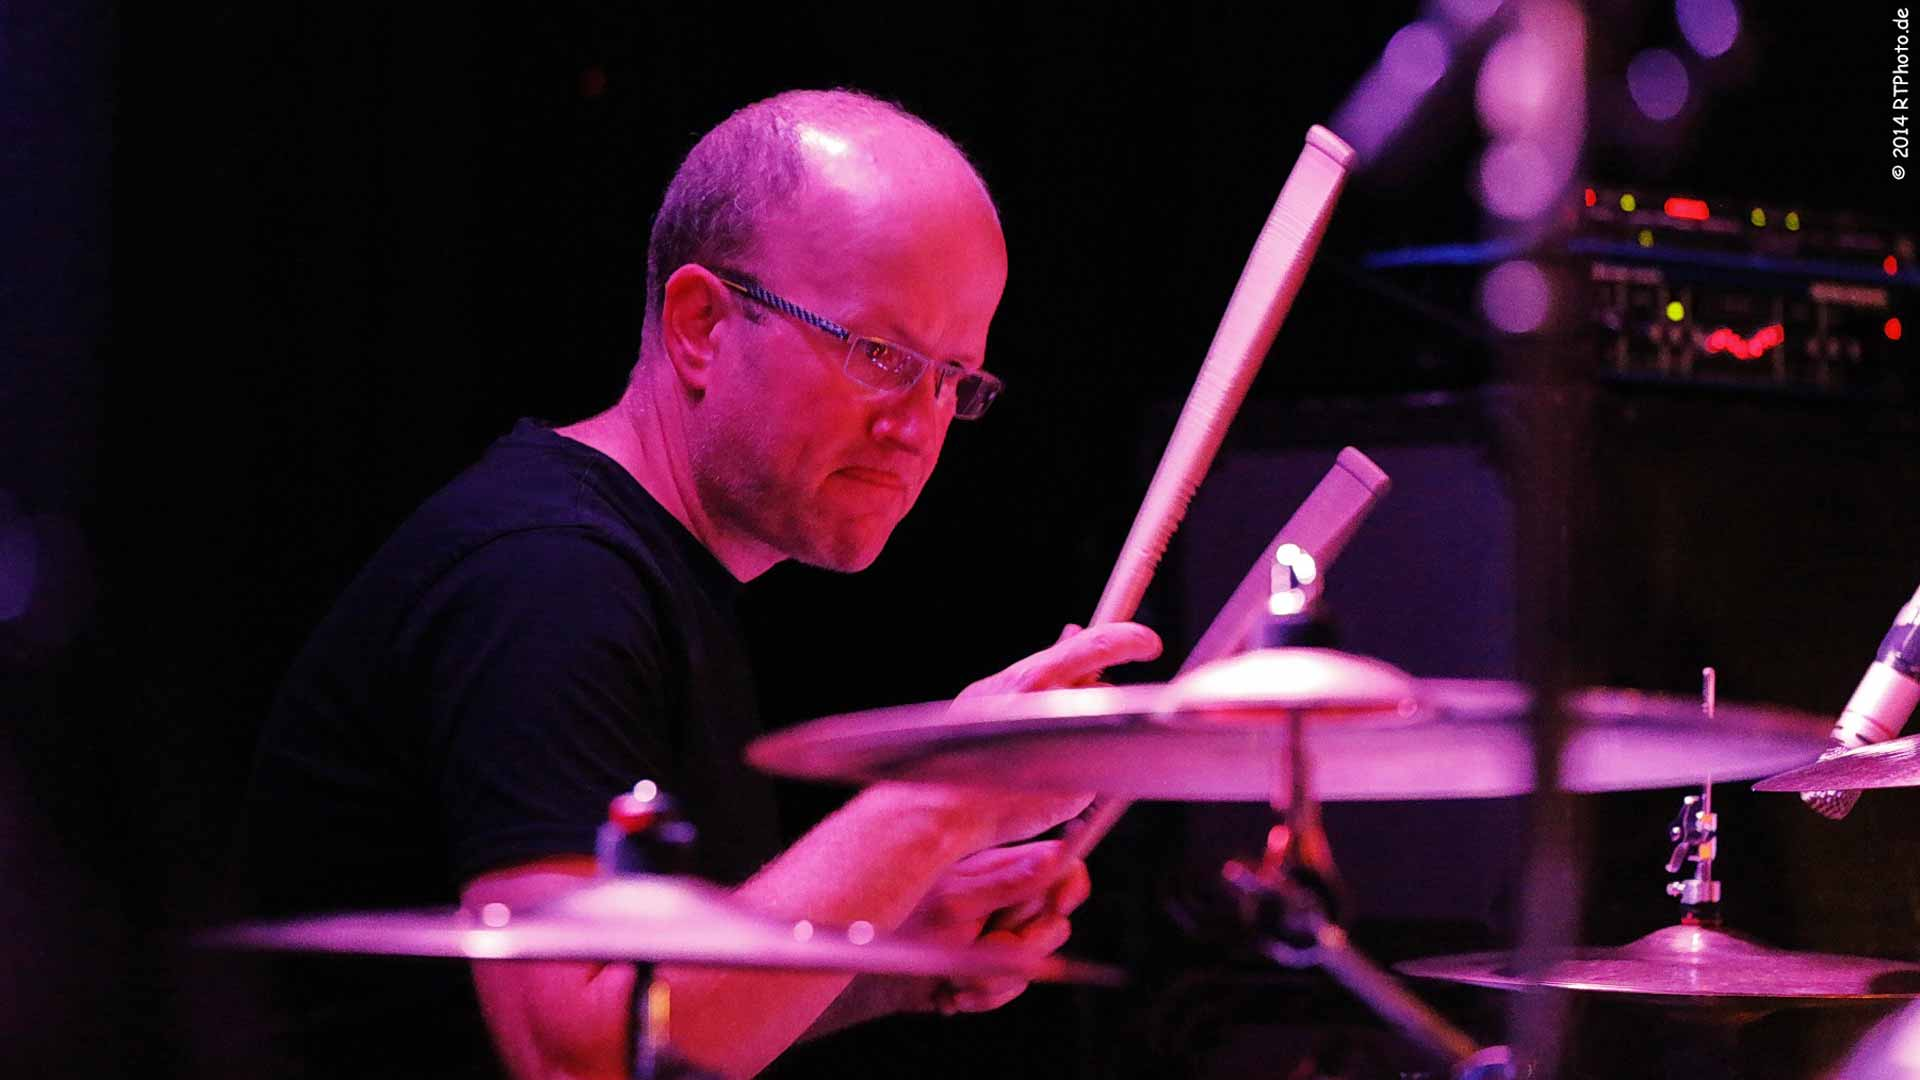 Schlagzeuglehrer Christoph Herber